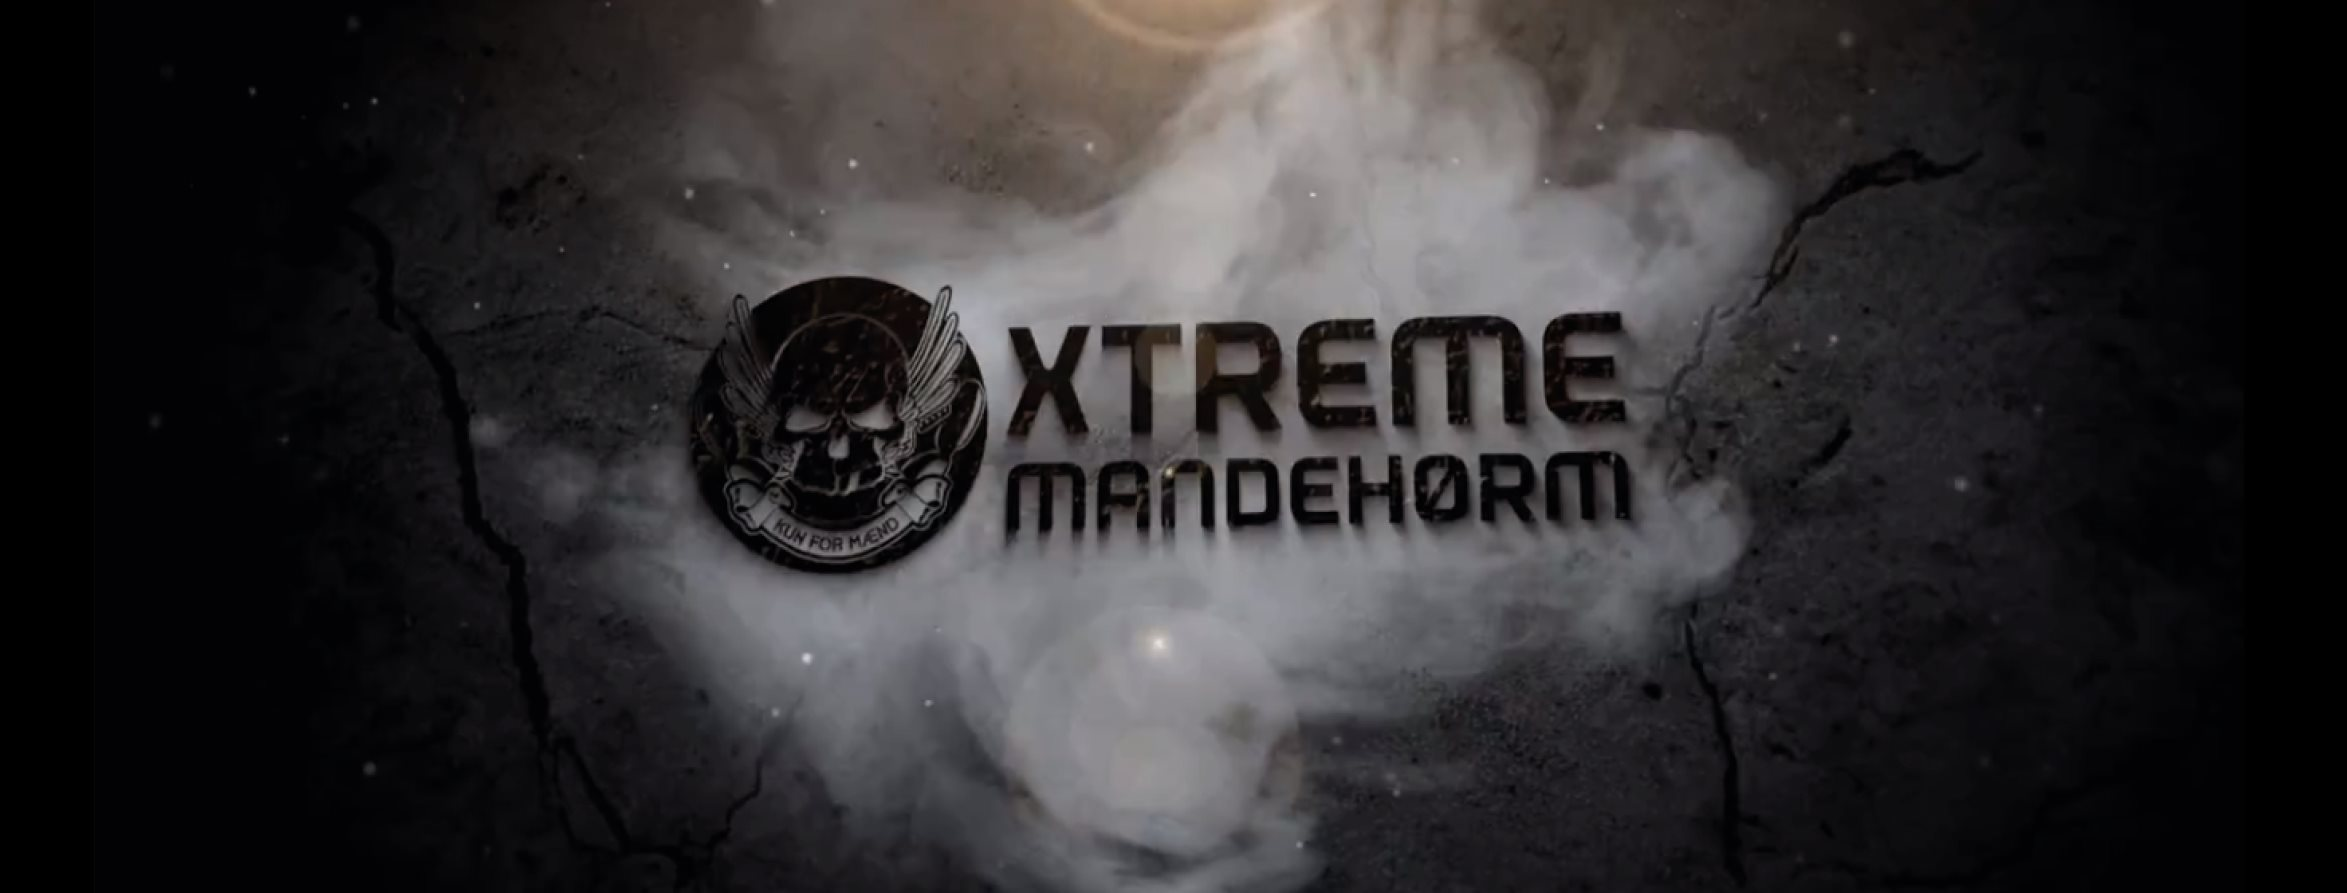 Xtreme Mandehørm – Mens Mudrace